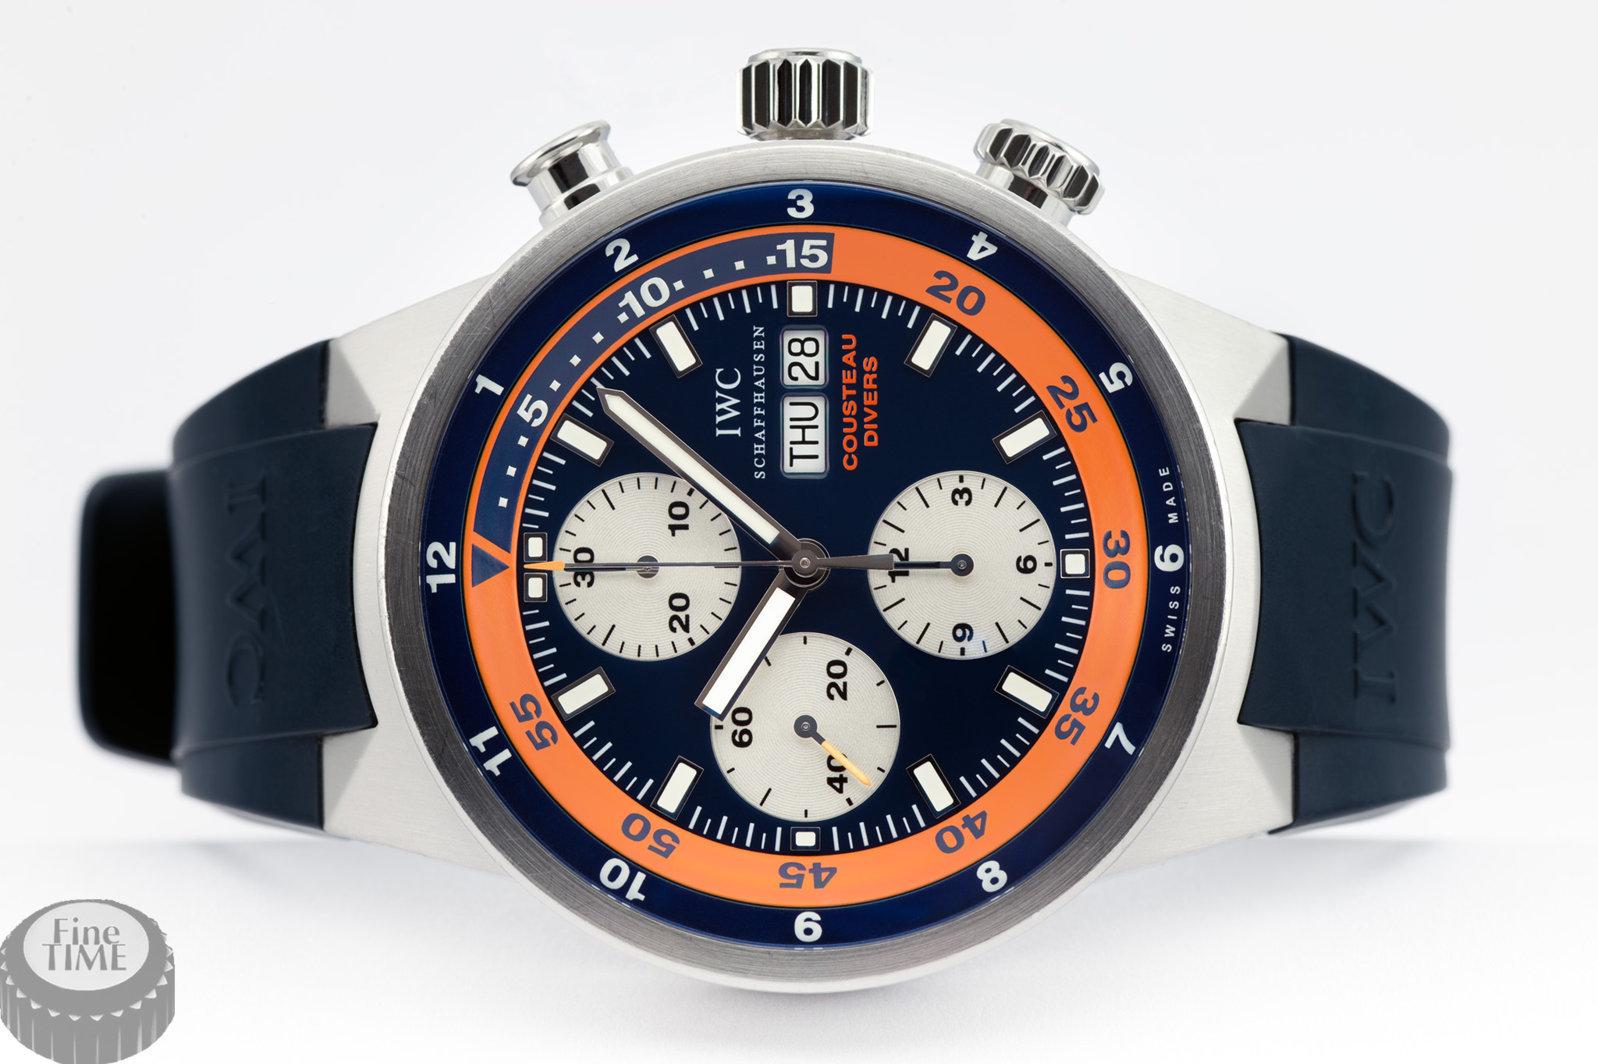 iwc-aquatimer-chronograph-cousteau-divers-iw378101-01.jpg